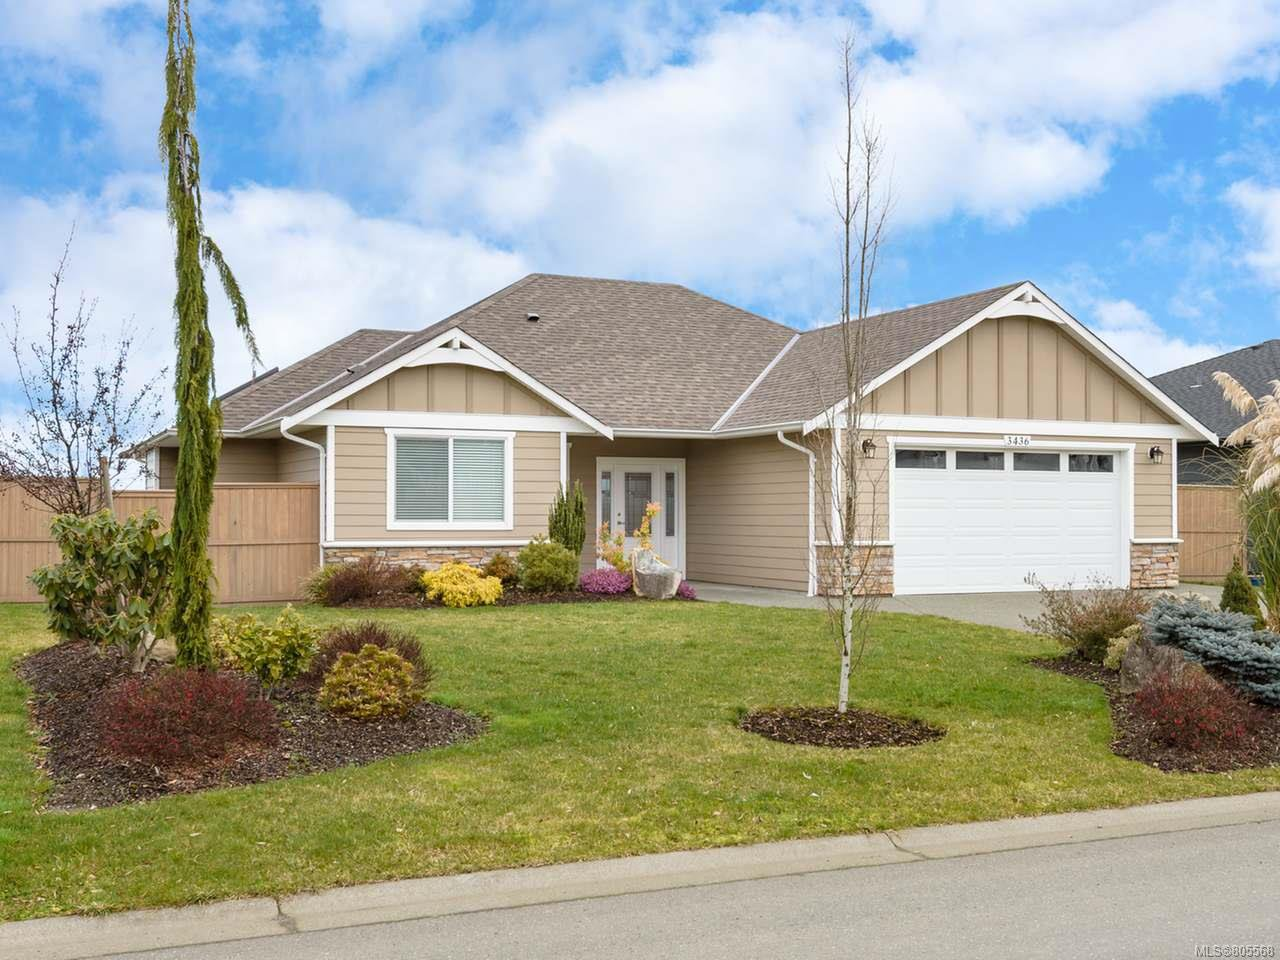 Main Photo: 3436 Stoneridge Ave in COURTENAY: CV Courtenay City House for sale (Comox Valley)  : MLS®# 805568